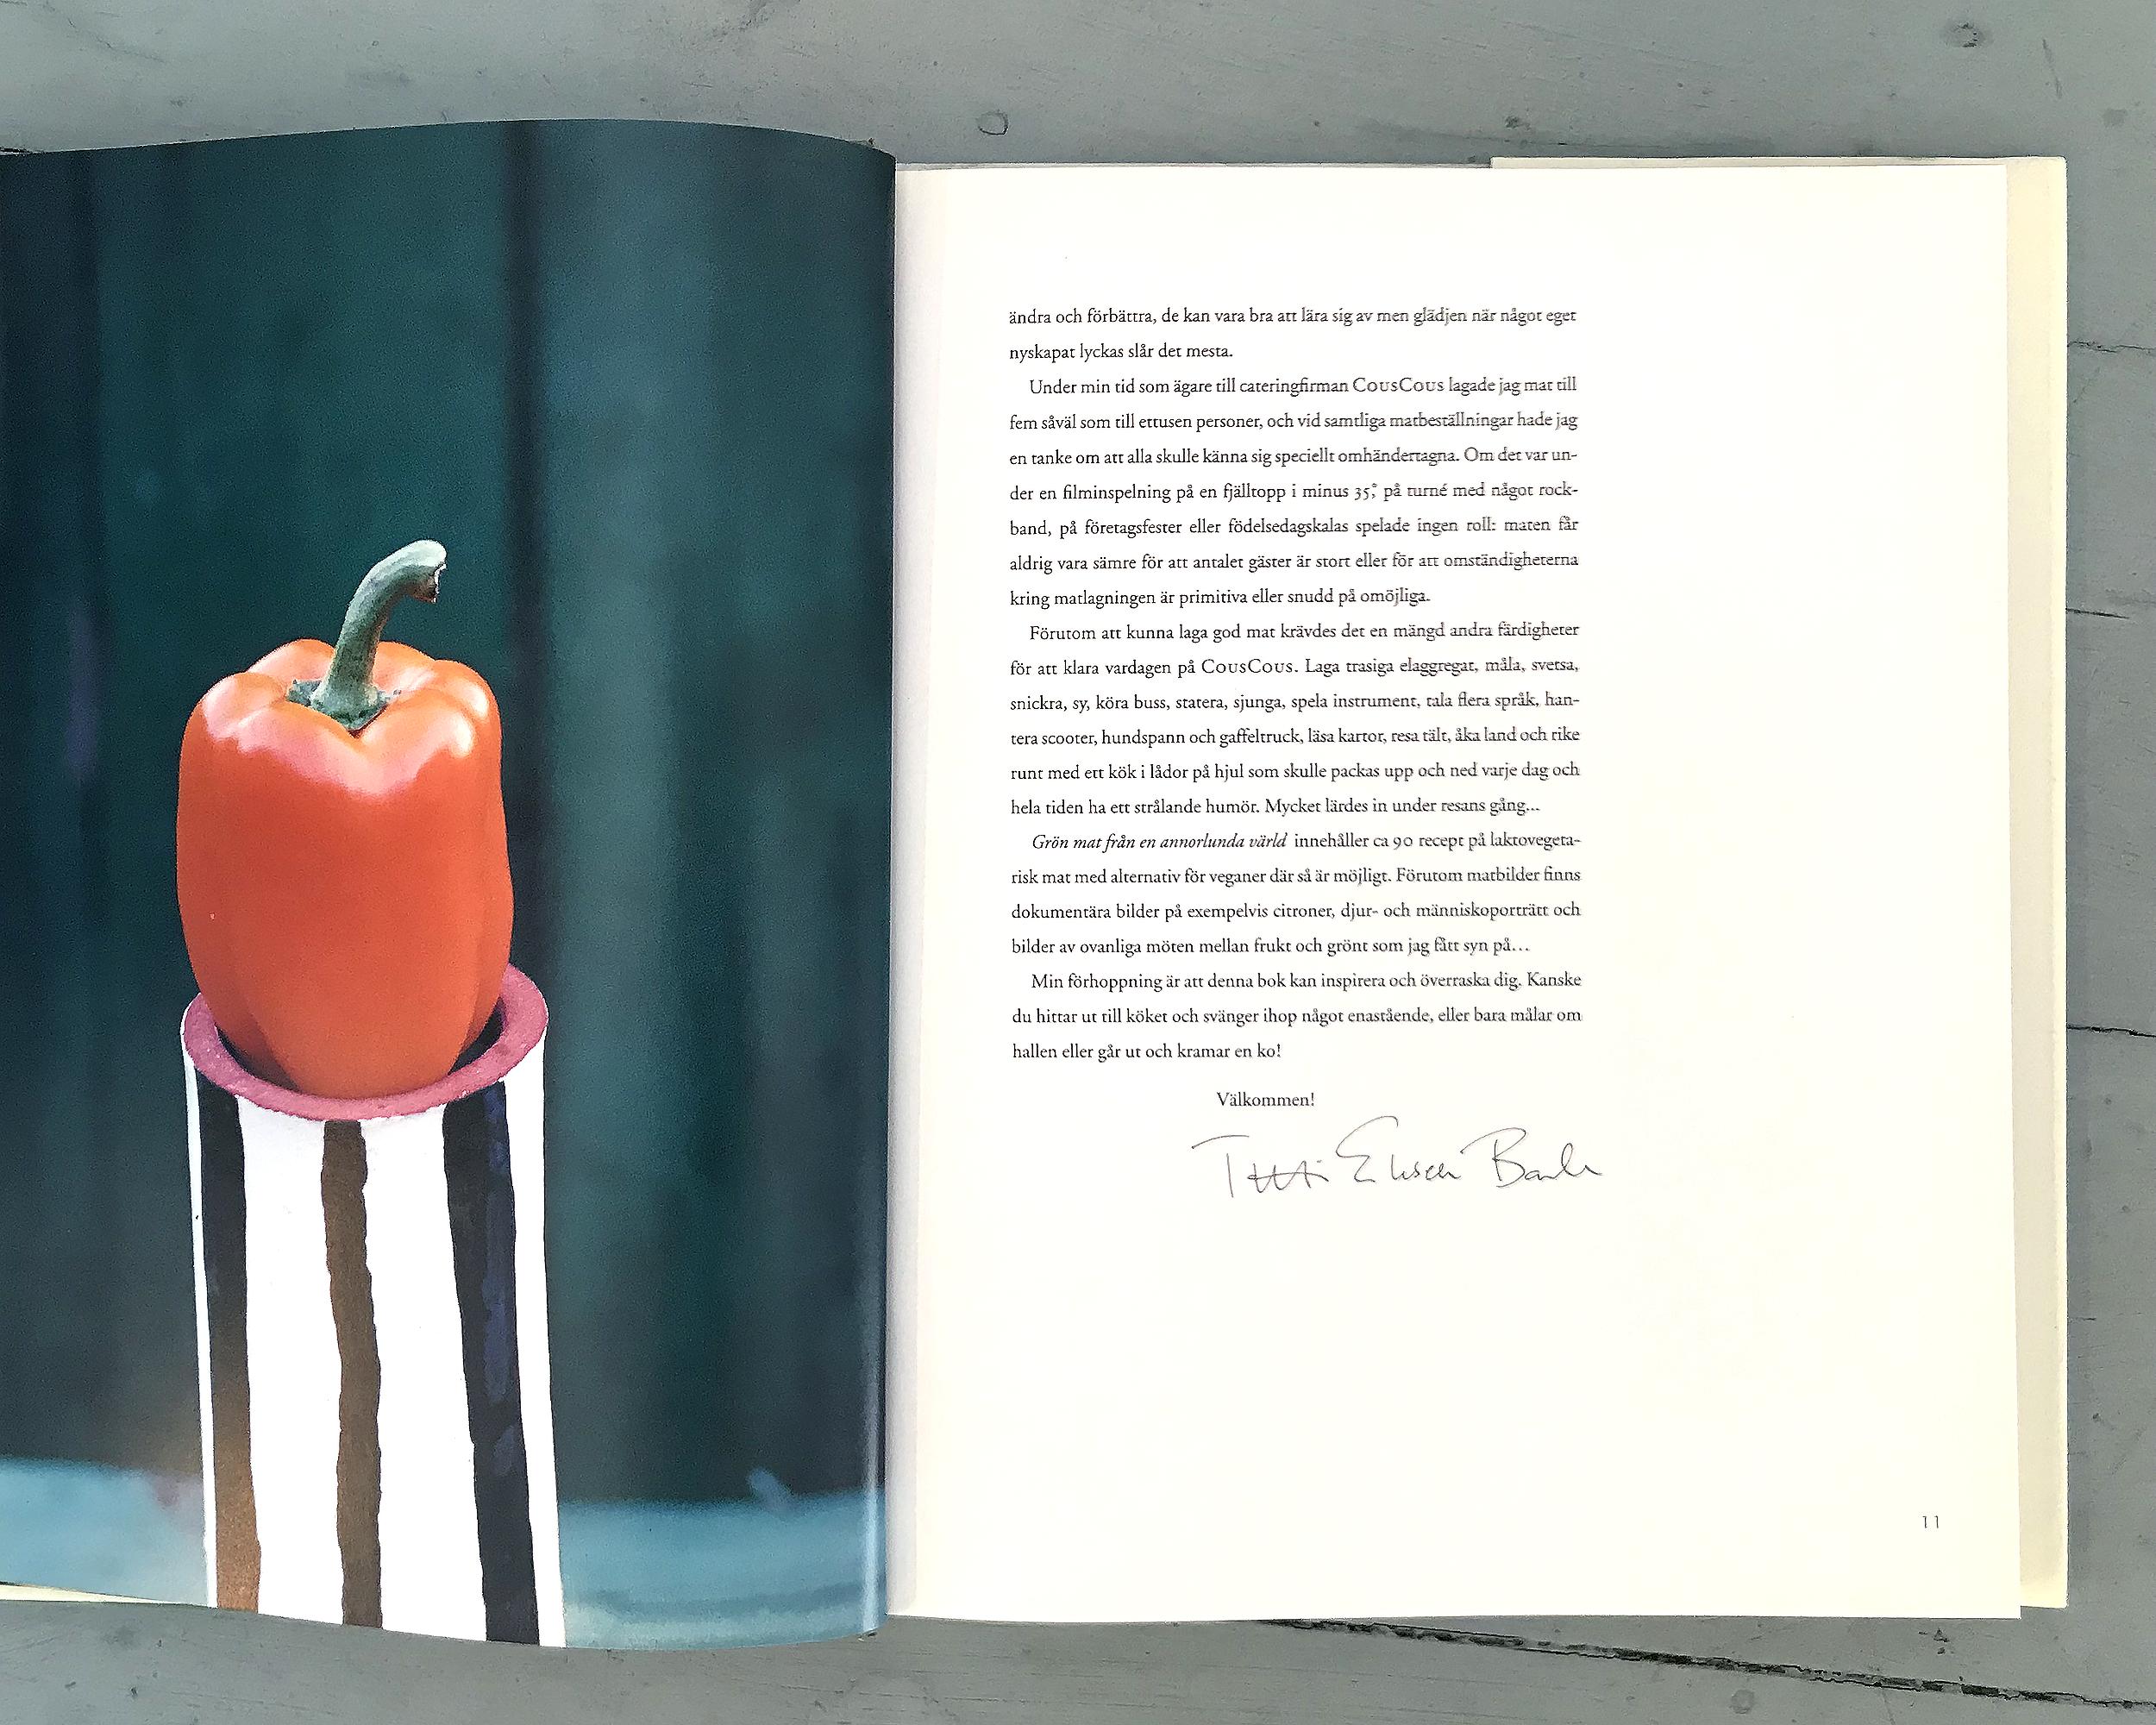 Kokboken Grön mat av Titti Erksell Barker.